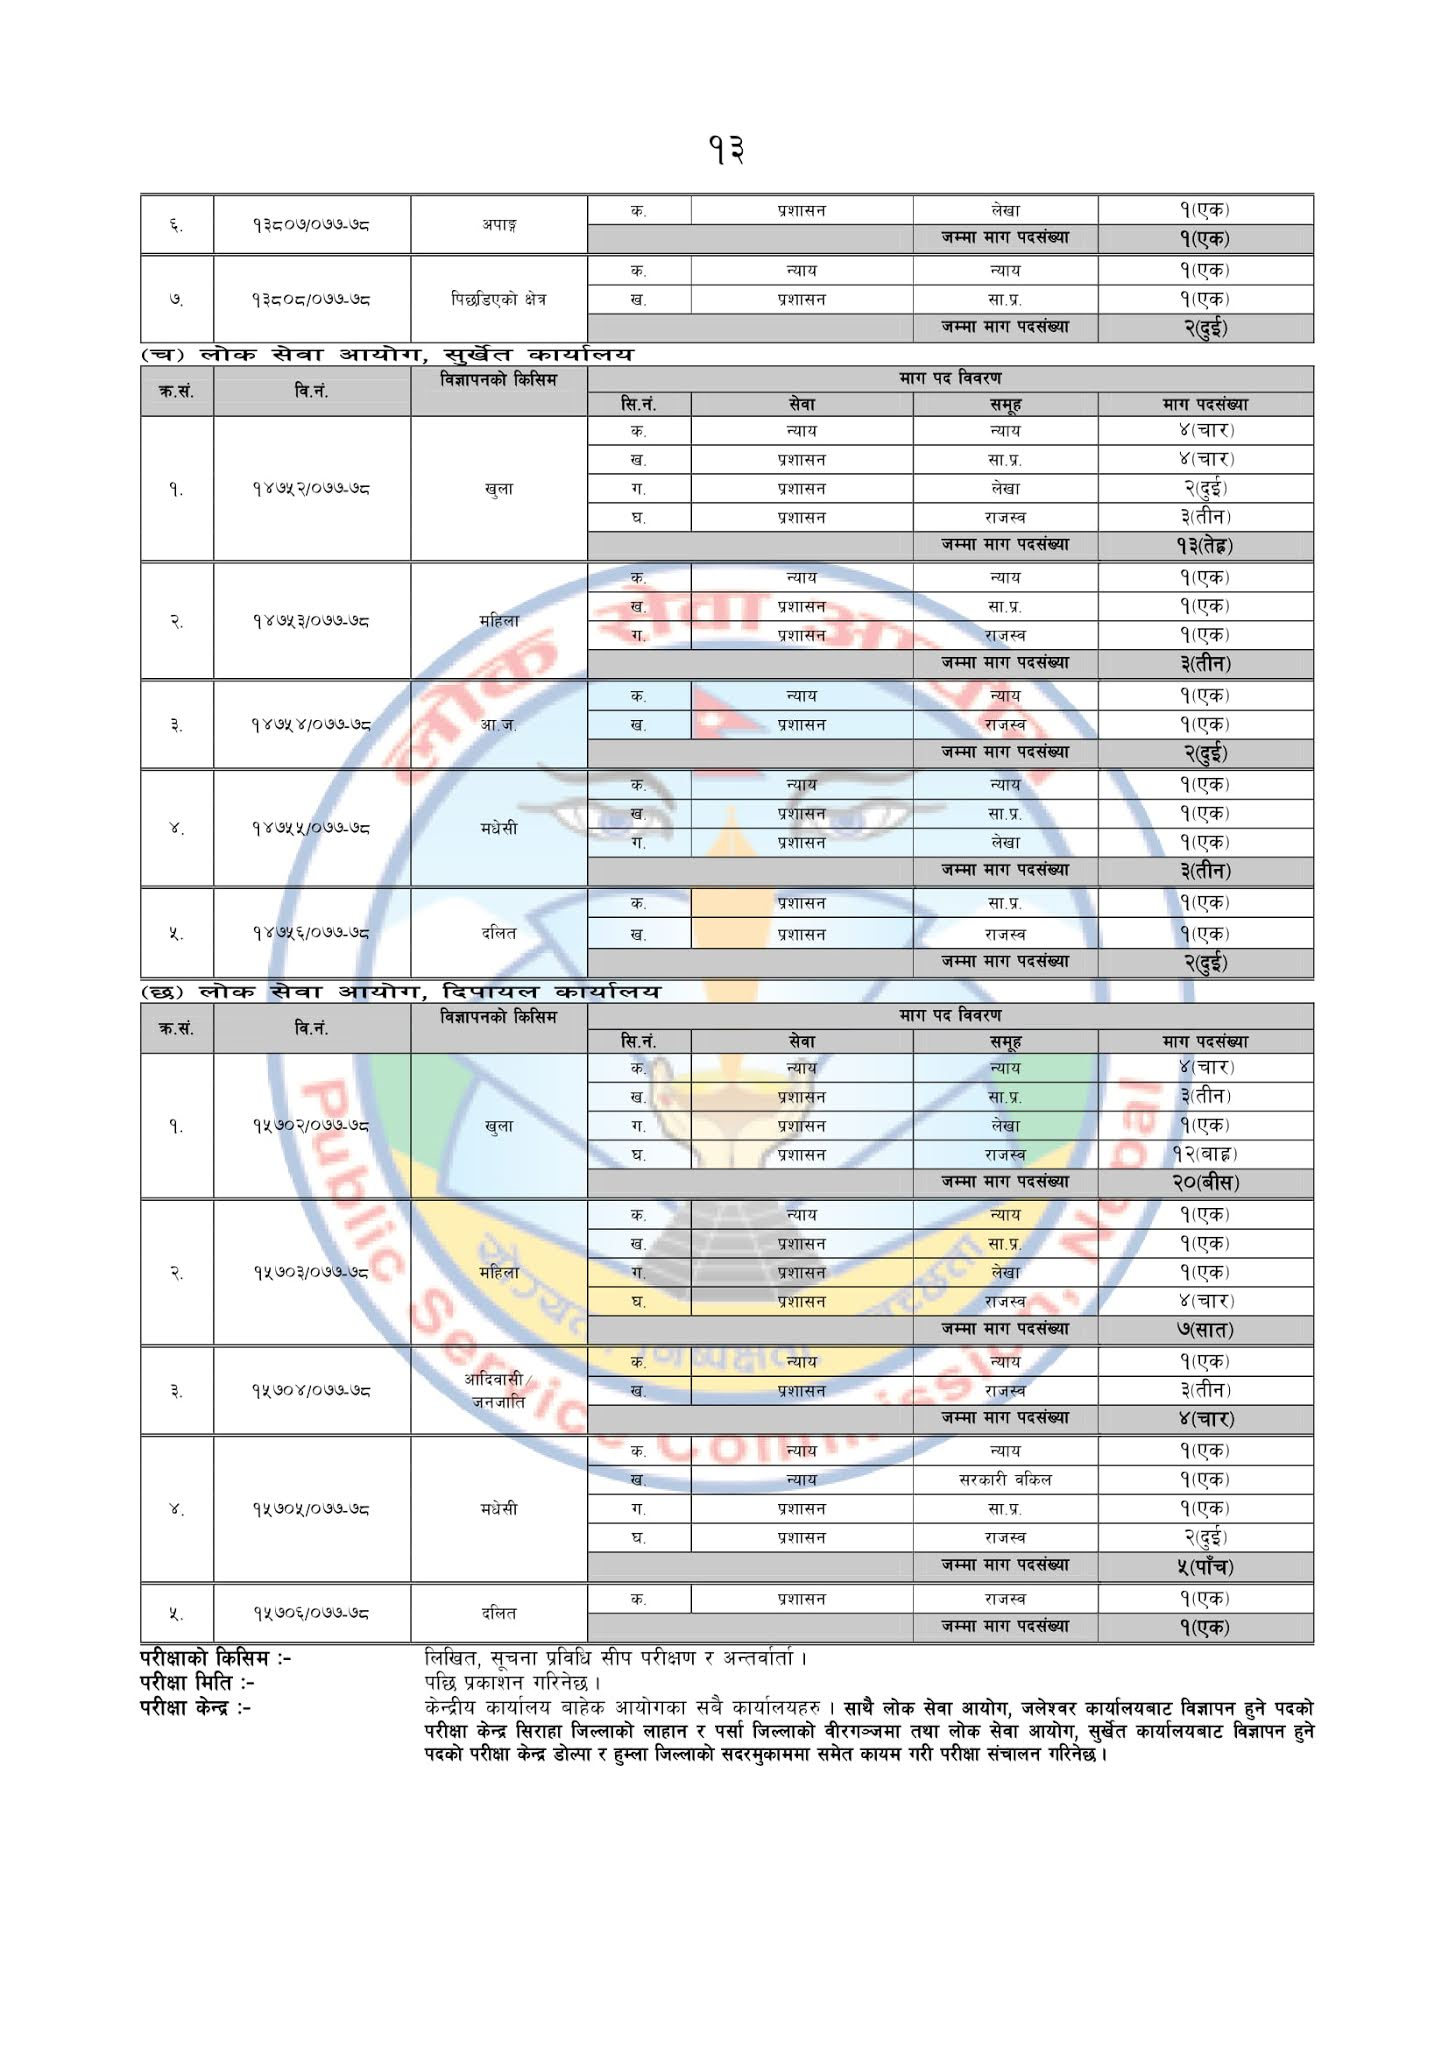 Vacancies Open For Nayab Subba (NaSu) - Non Gazetted First Class Post For Sanghiya Level.